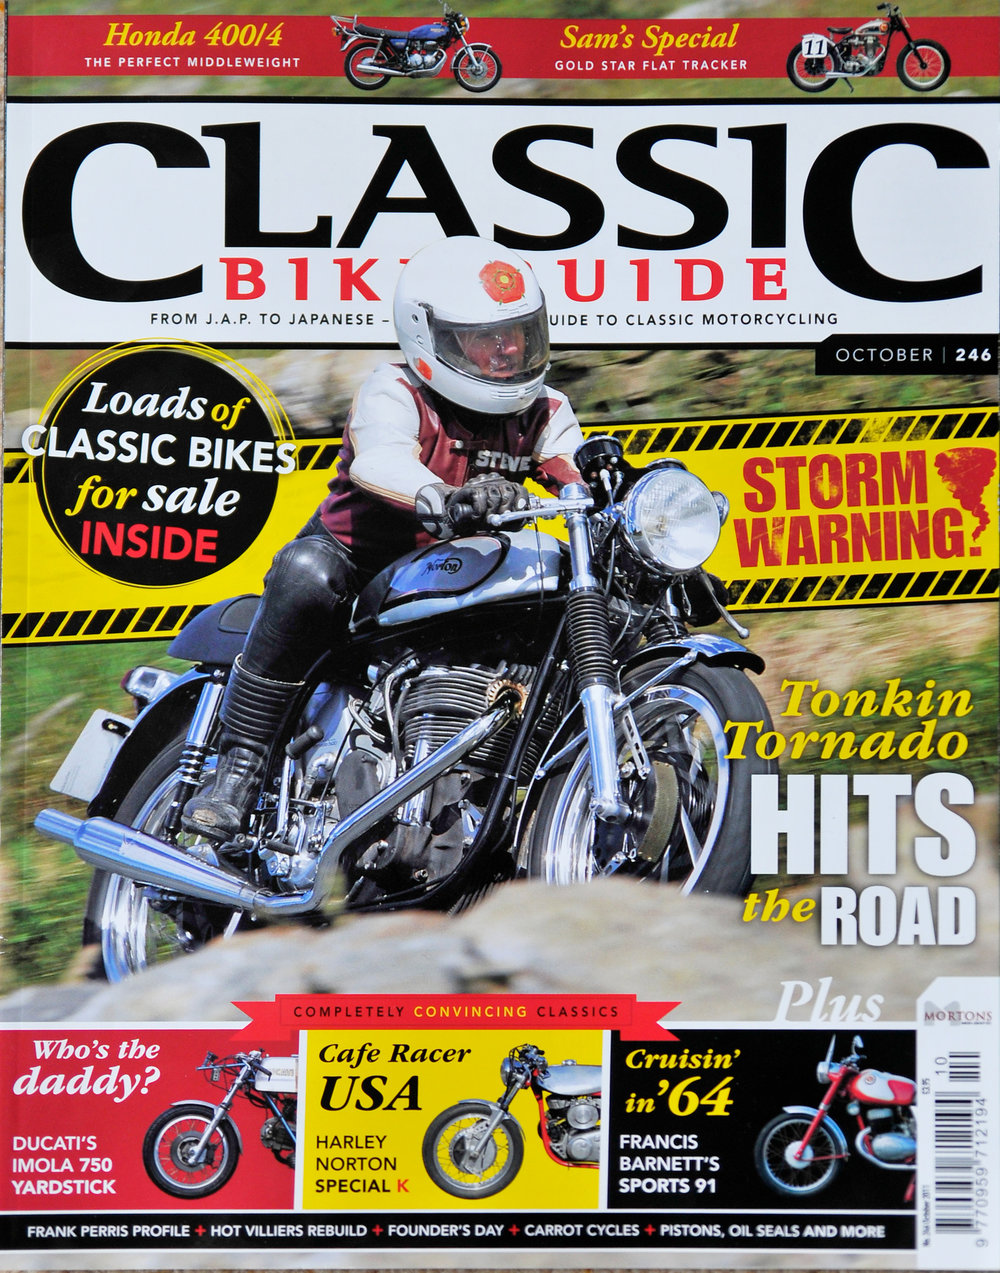 Classic Bike Guide Tornado .jpg